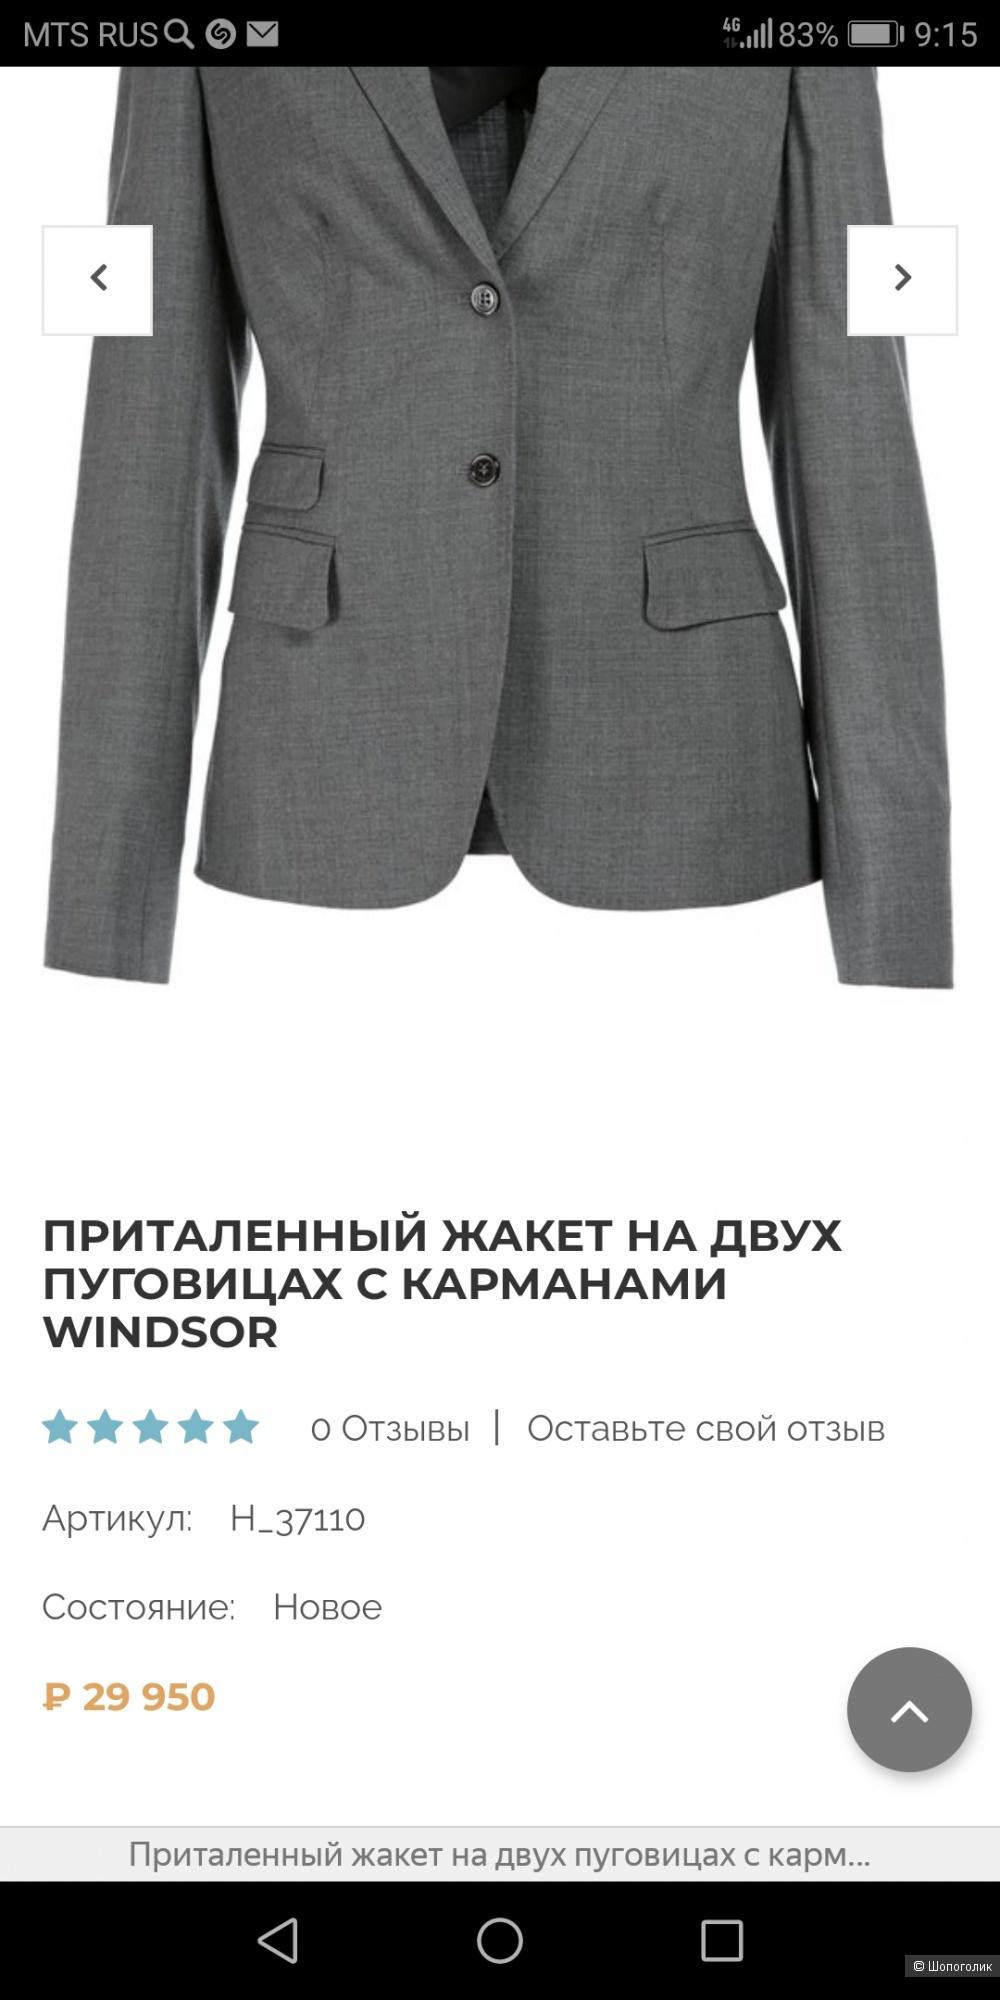 Приталенный жакет Zara, размер 42-44